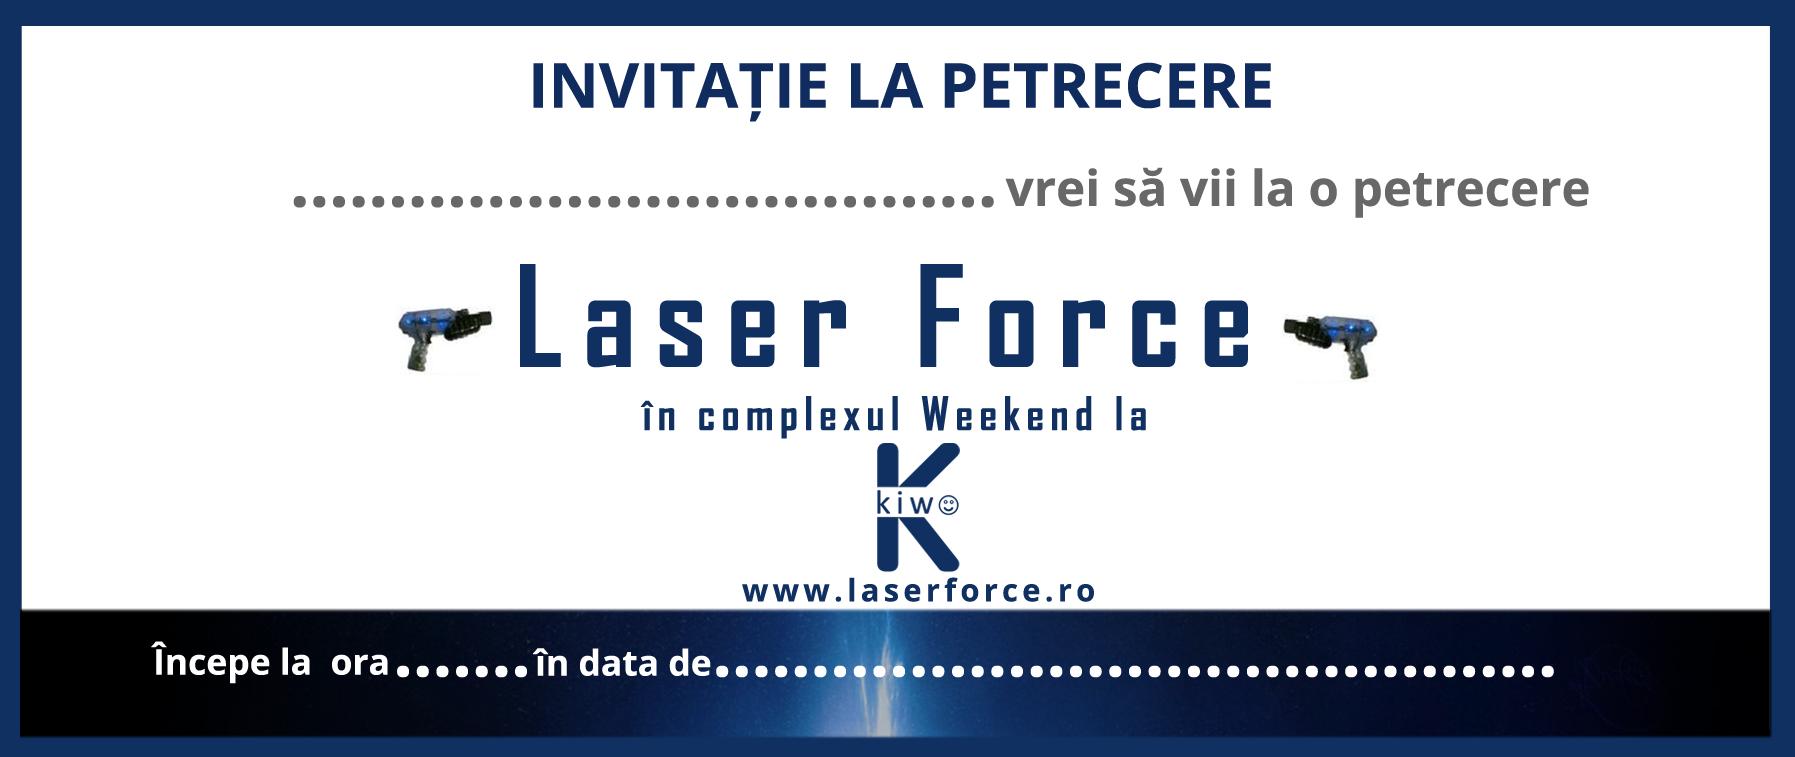 petrecere-laser-force-invitatie